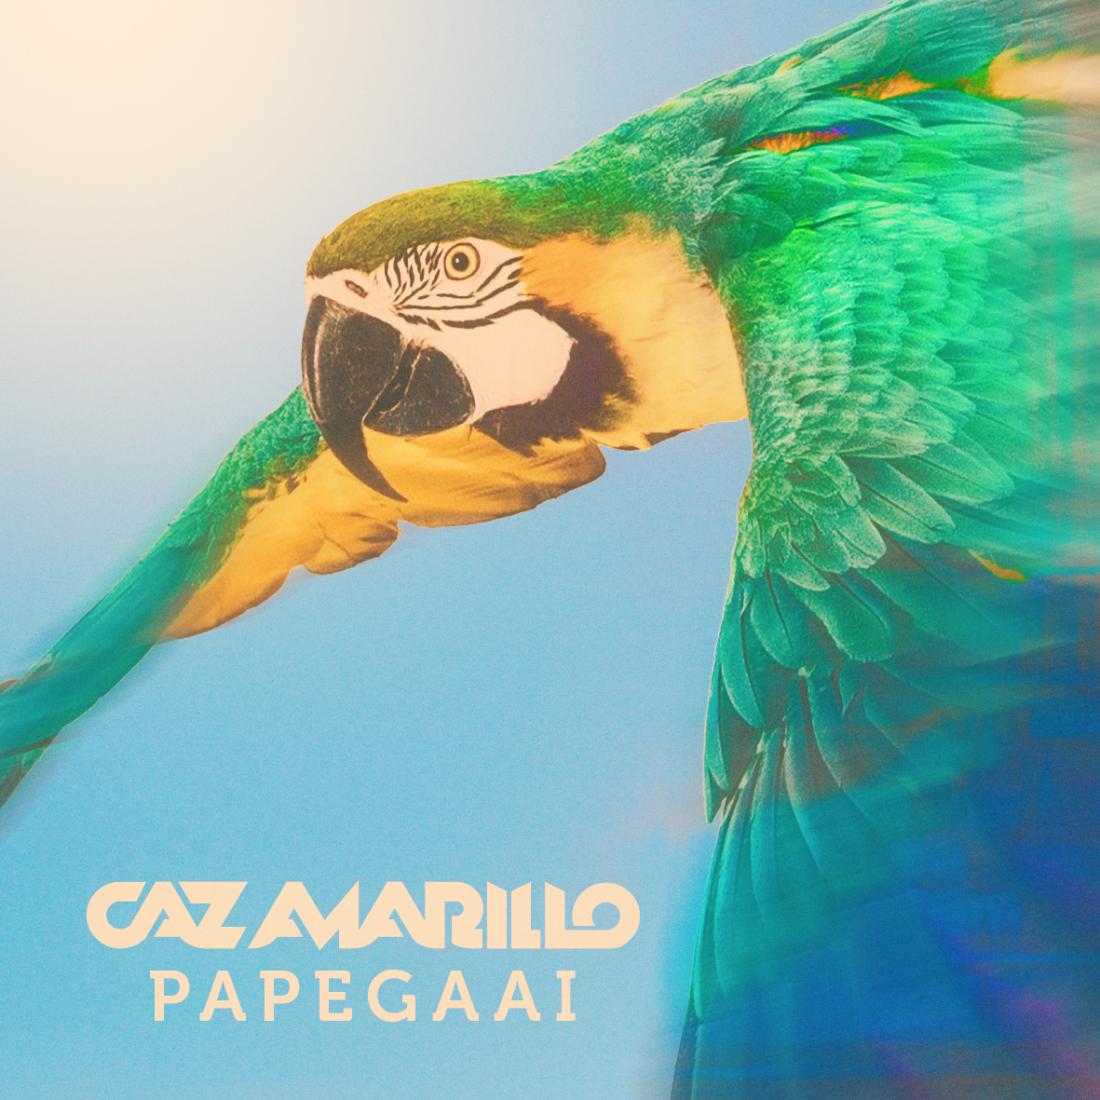 Caz Amarillo Papegaai